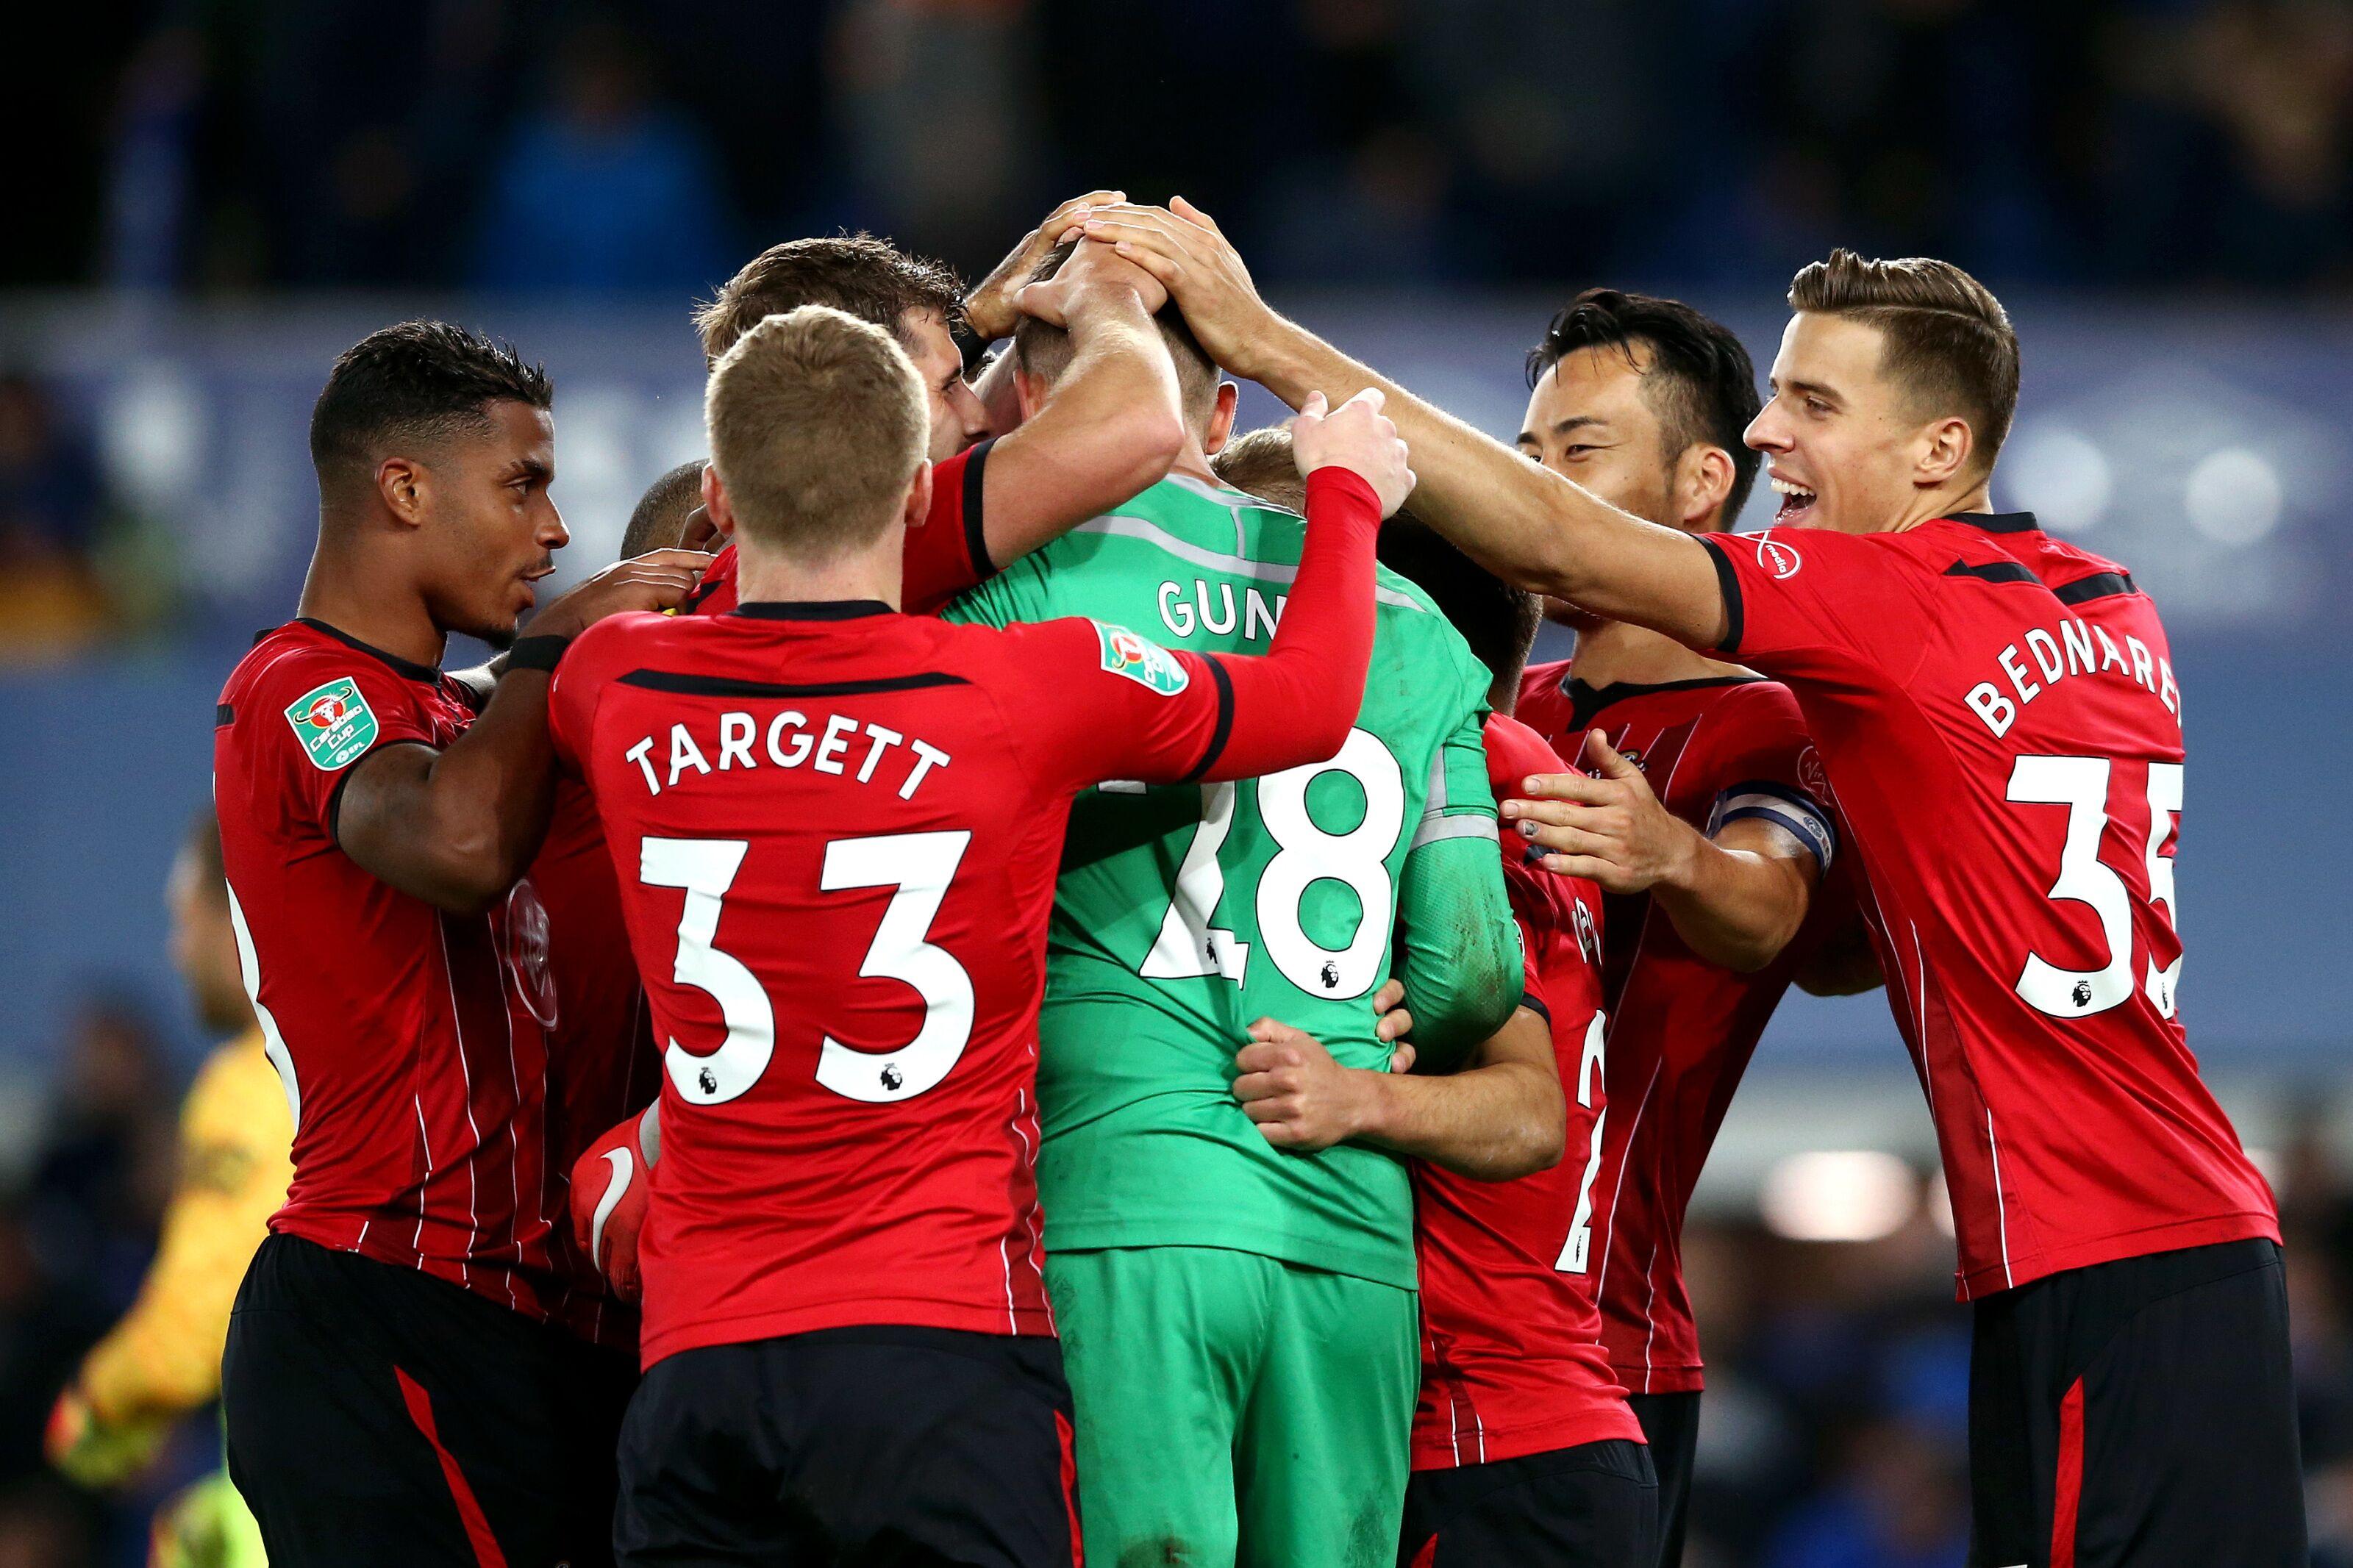 Everton 1-1 Southampton: Three key players – 02/10/19